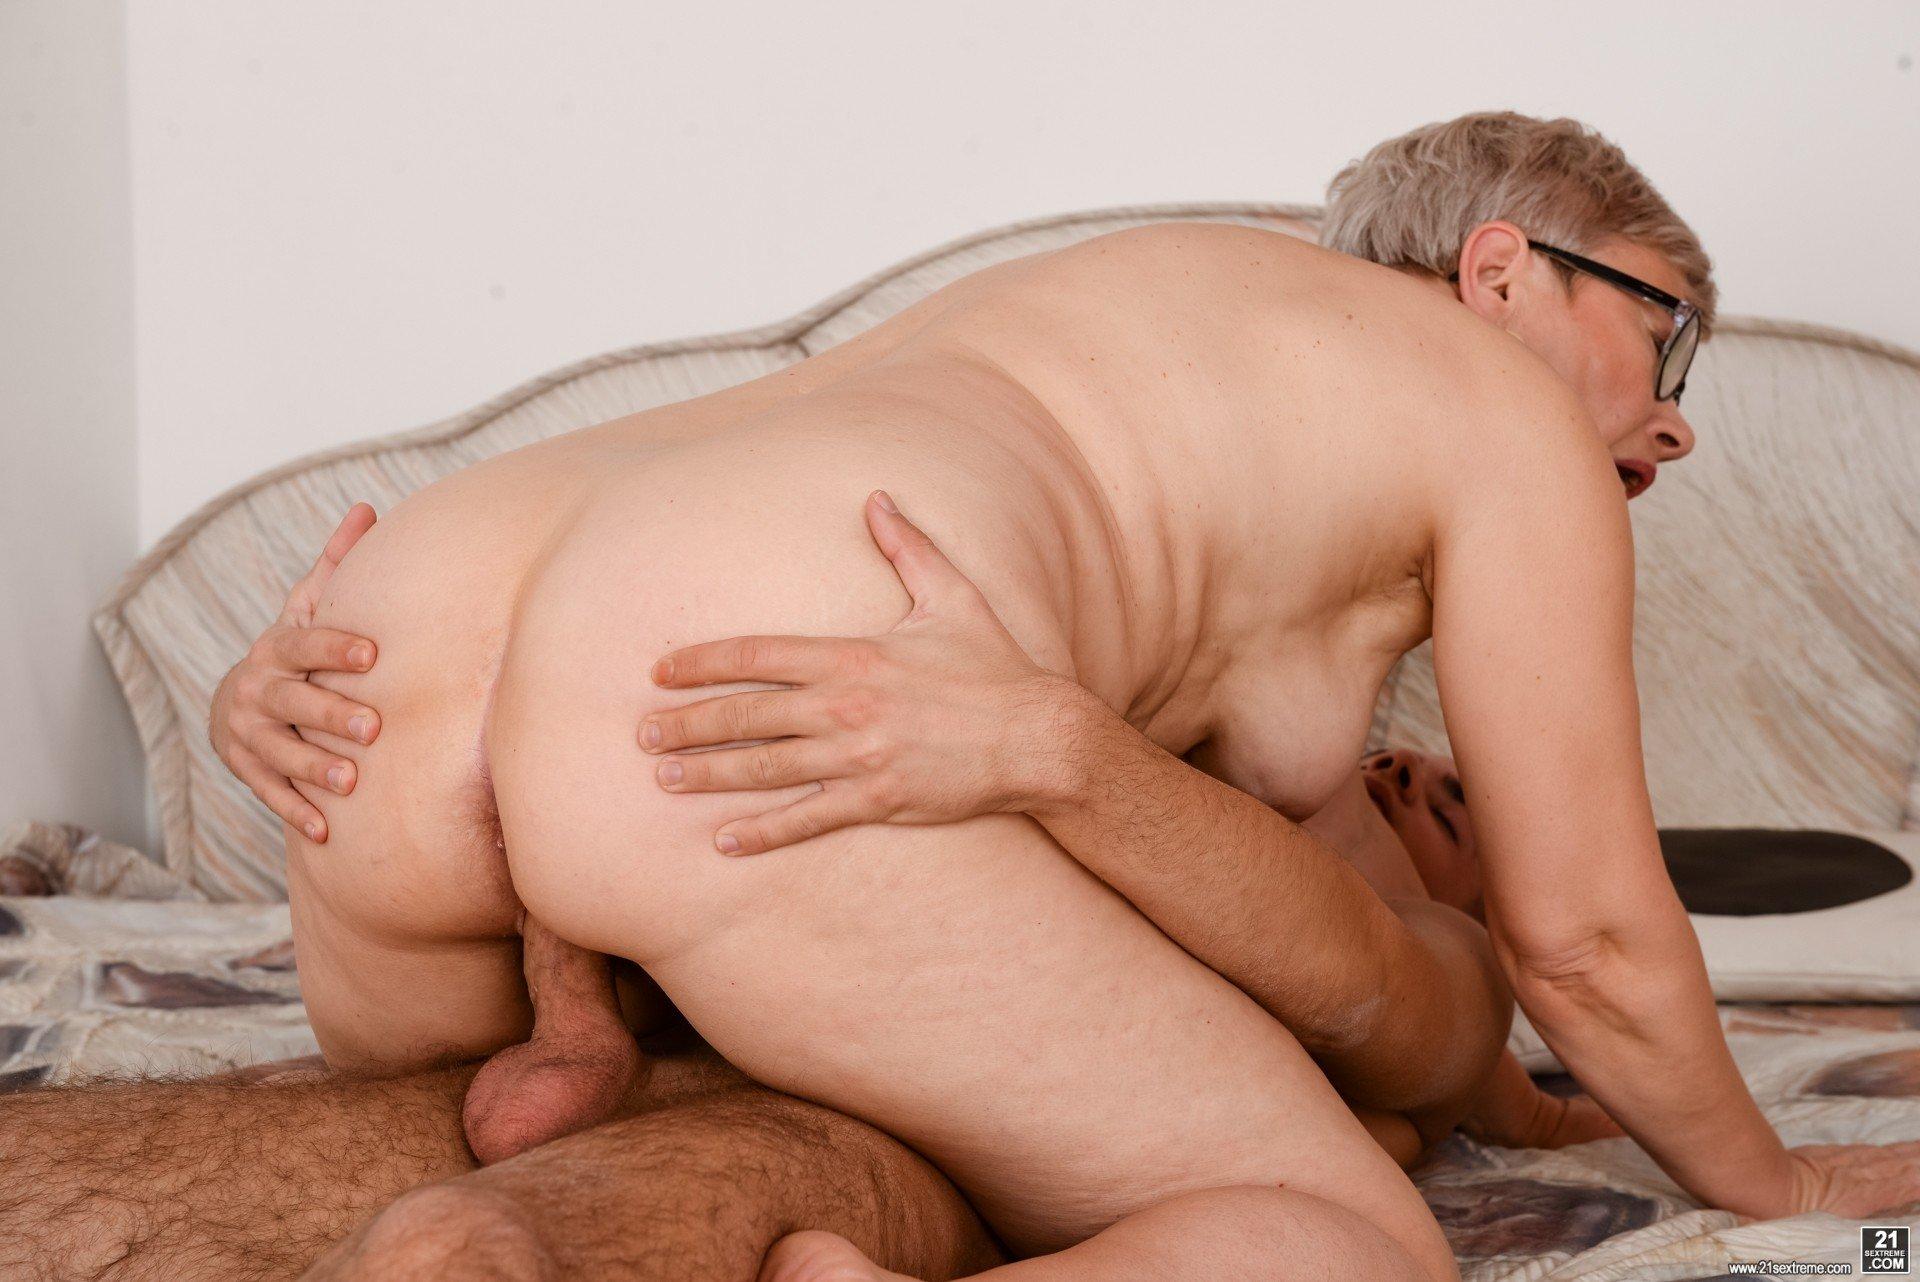 Мужик трахнул бабку раком порно фото бесплатно